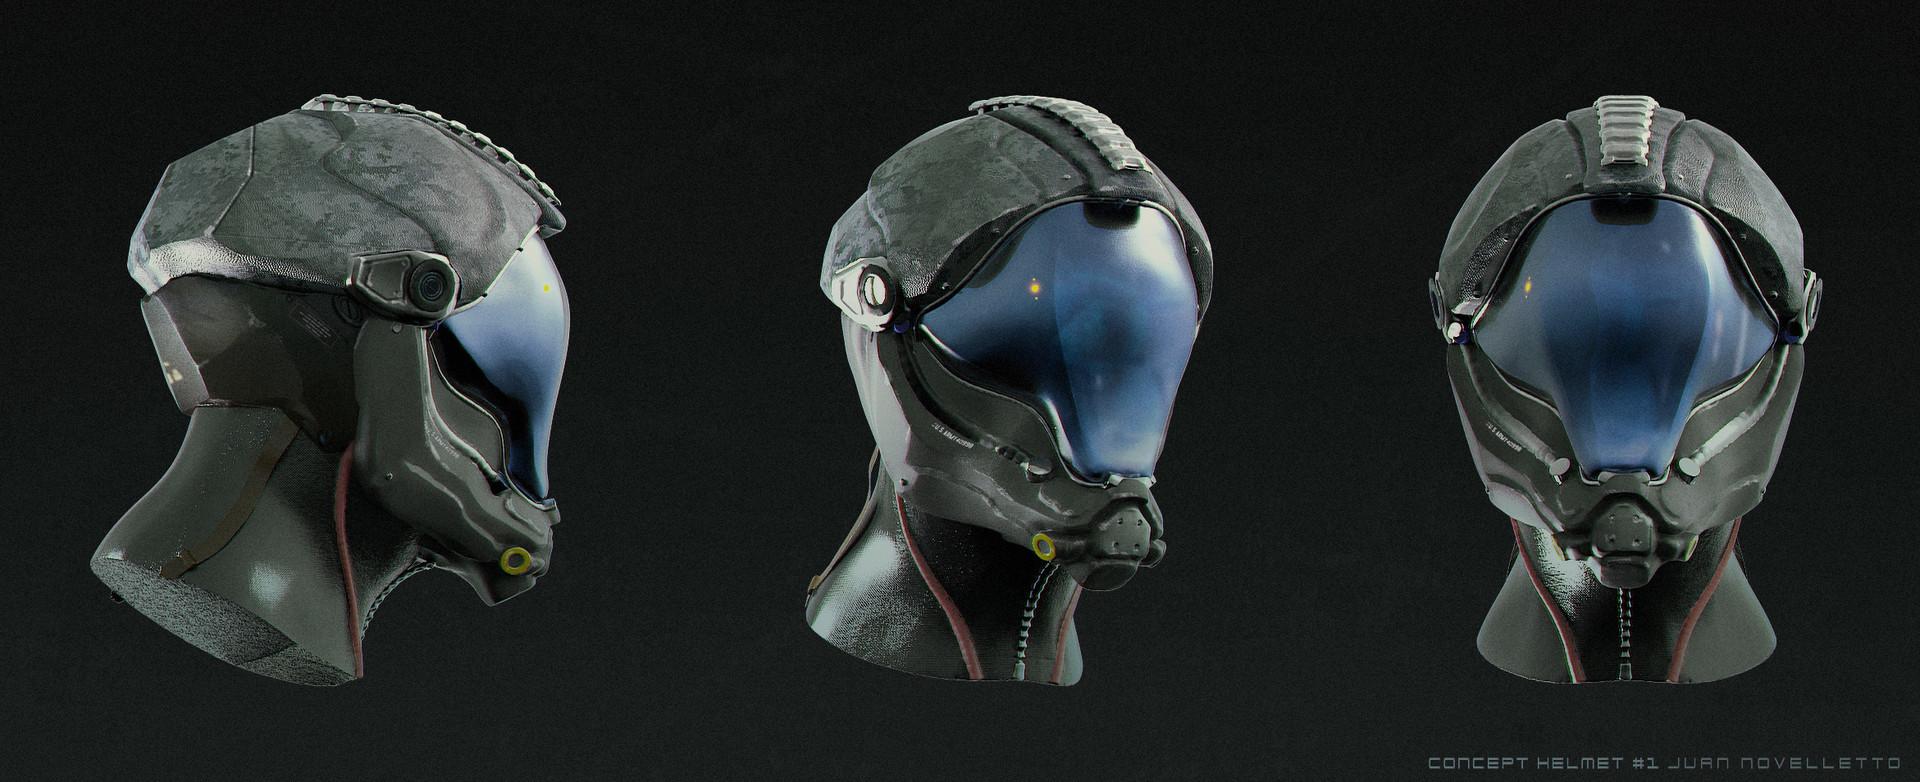 Juan novelletto helmet 1 views